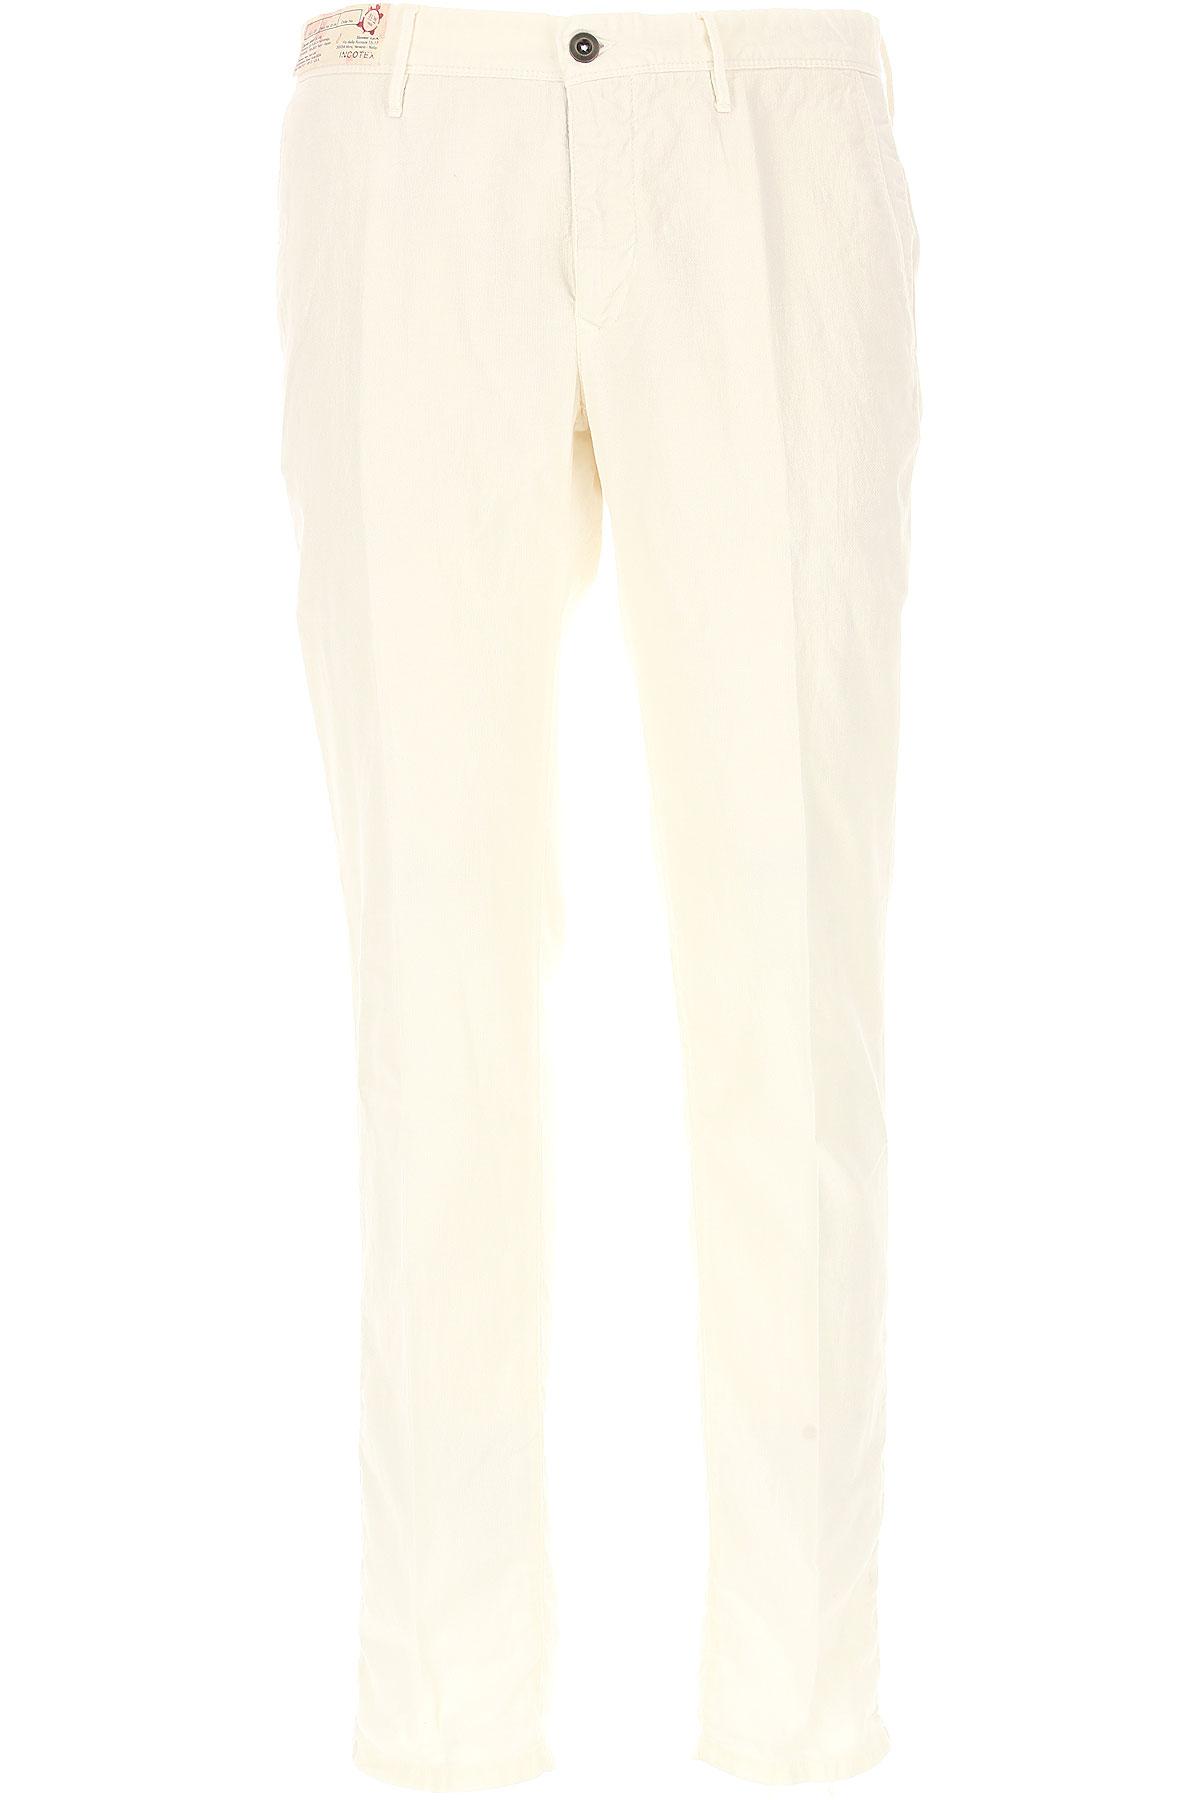 Incotex Pants for Men On Sale, White, Cotton, 2019, 32 33 36